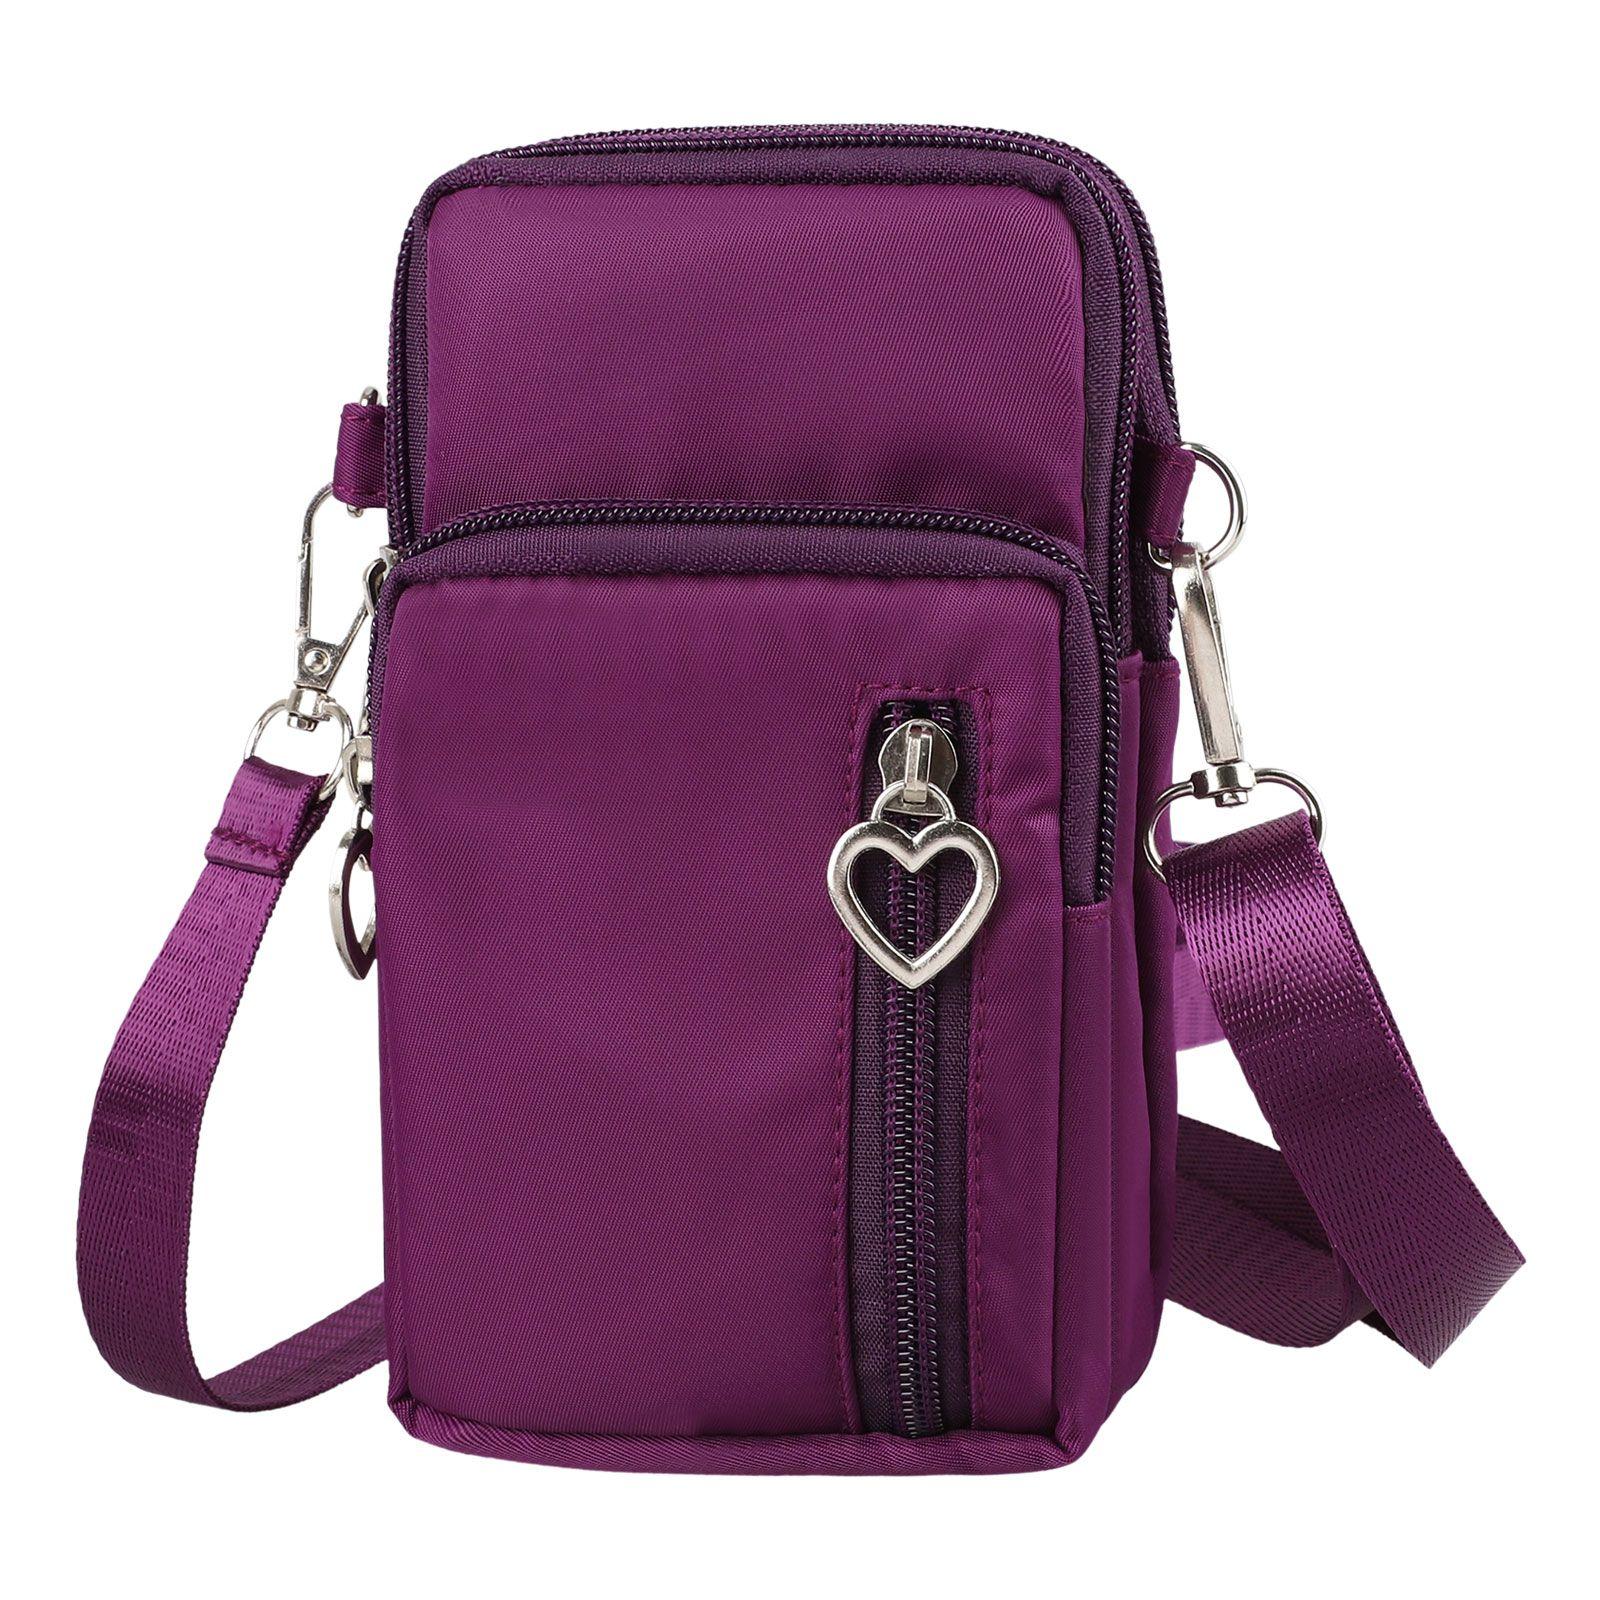 Cell phone pouch eeekit waterproof cellphone purse